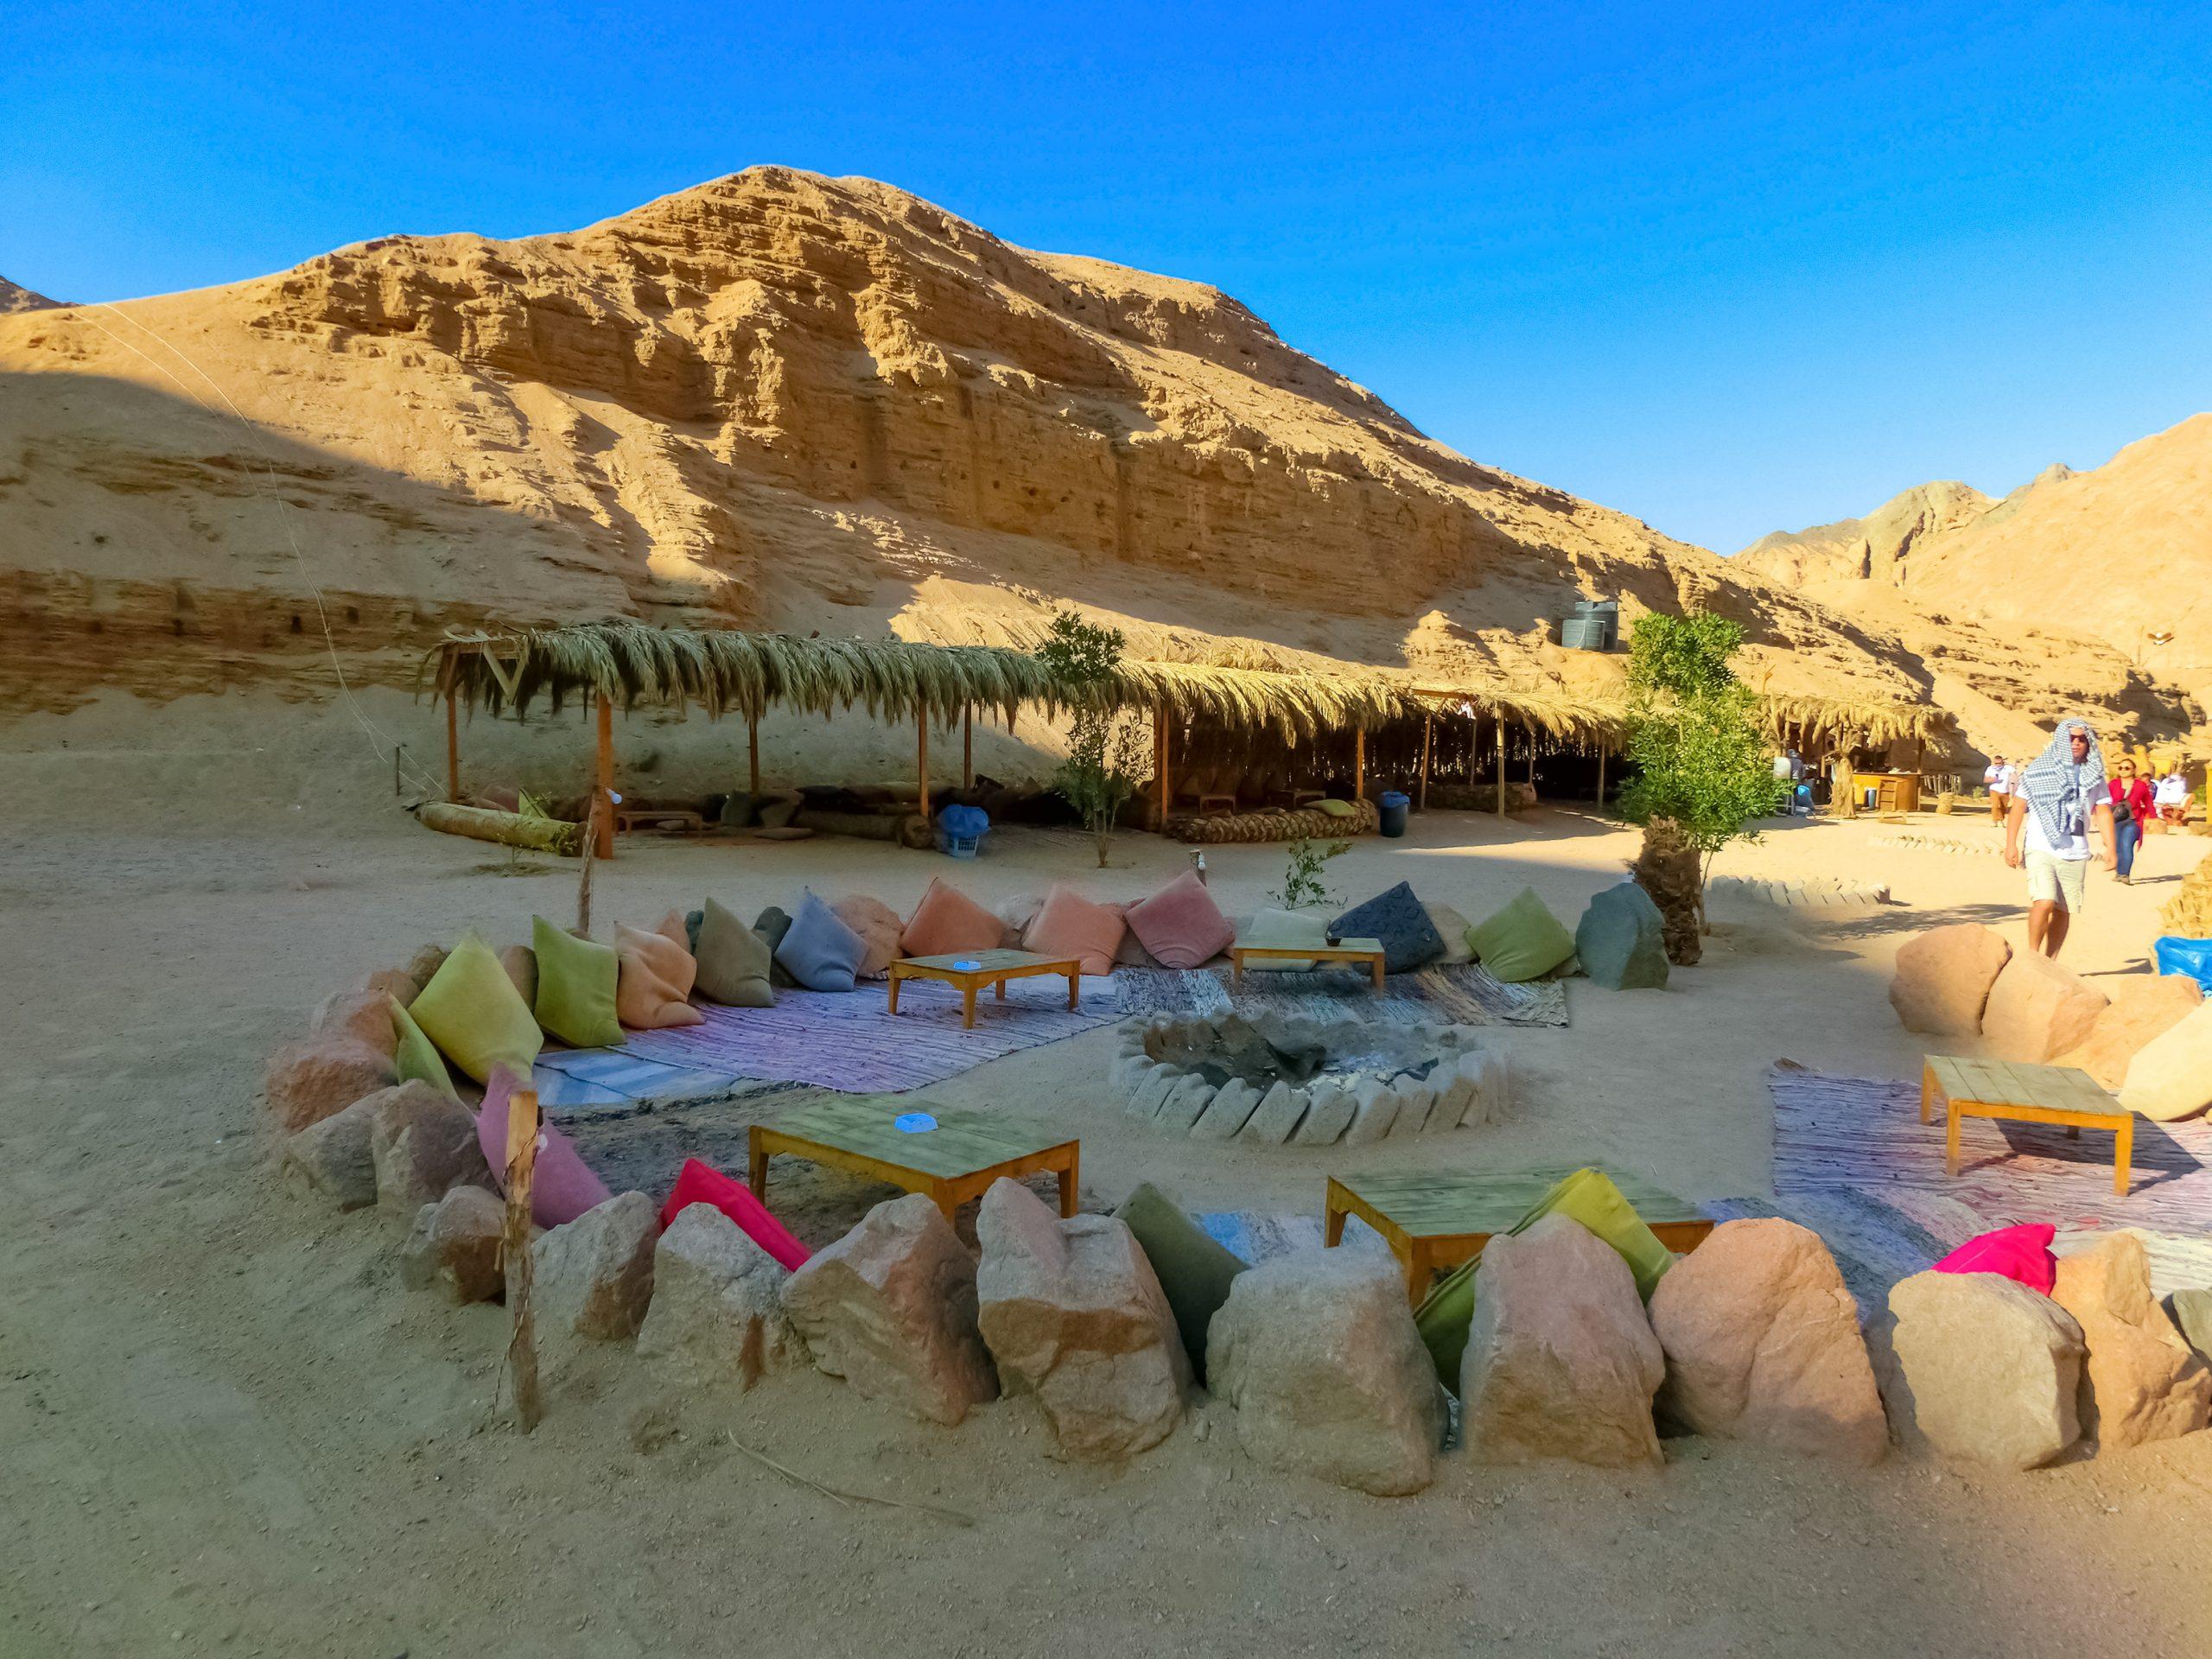 Bedouin Camp Sinai